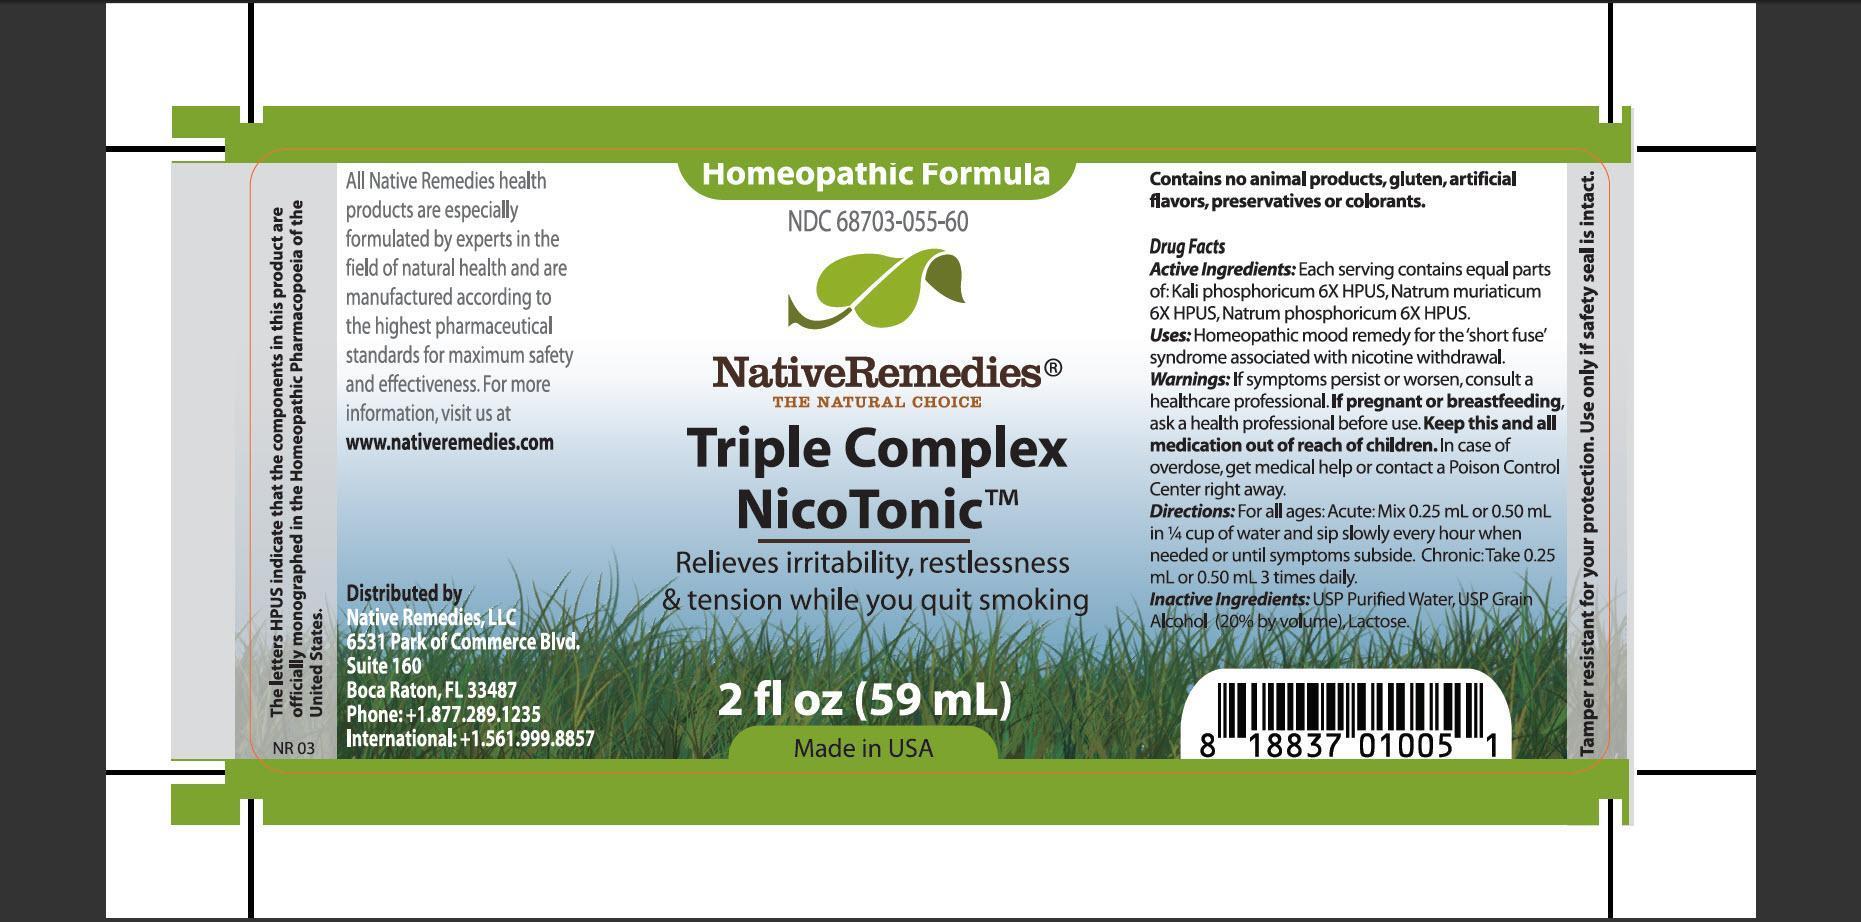 Triple Complex Nicotonic (Kali Ohosphoricum, Natrum Muriaticum, Natrum Ohosphoricum) Tincture [Native Remedies, Llc]